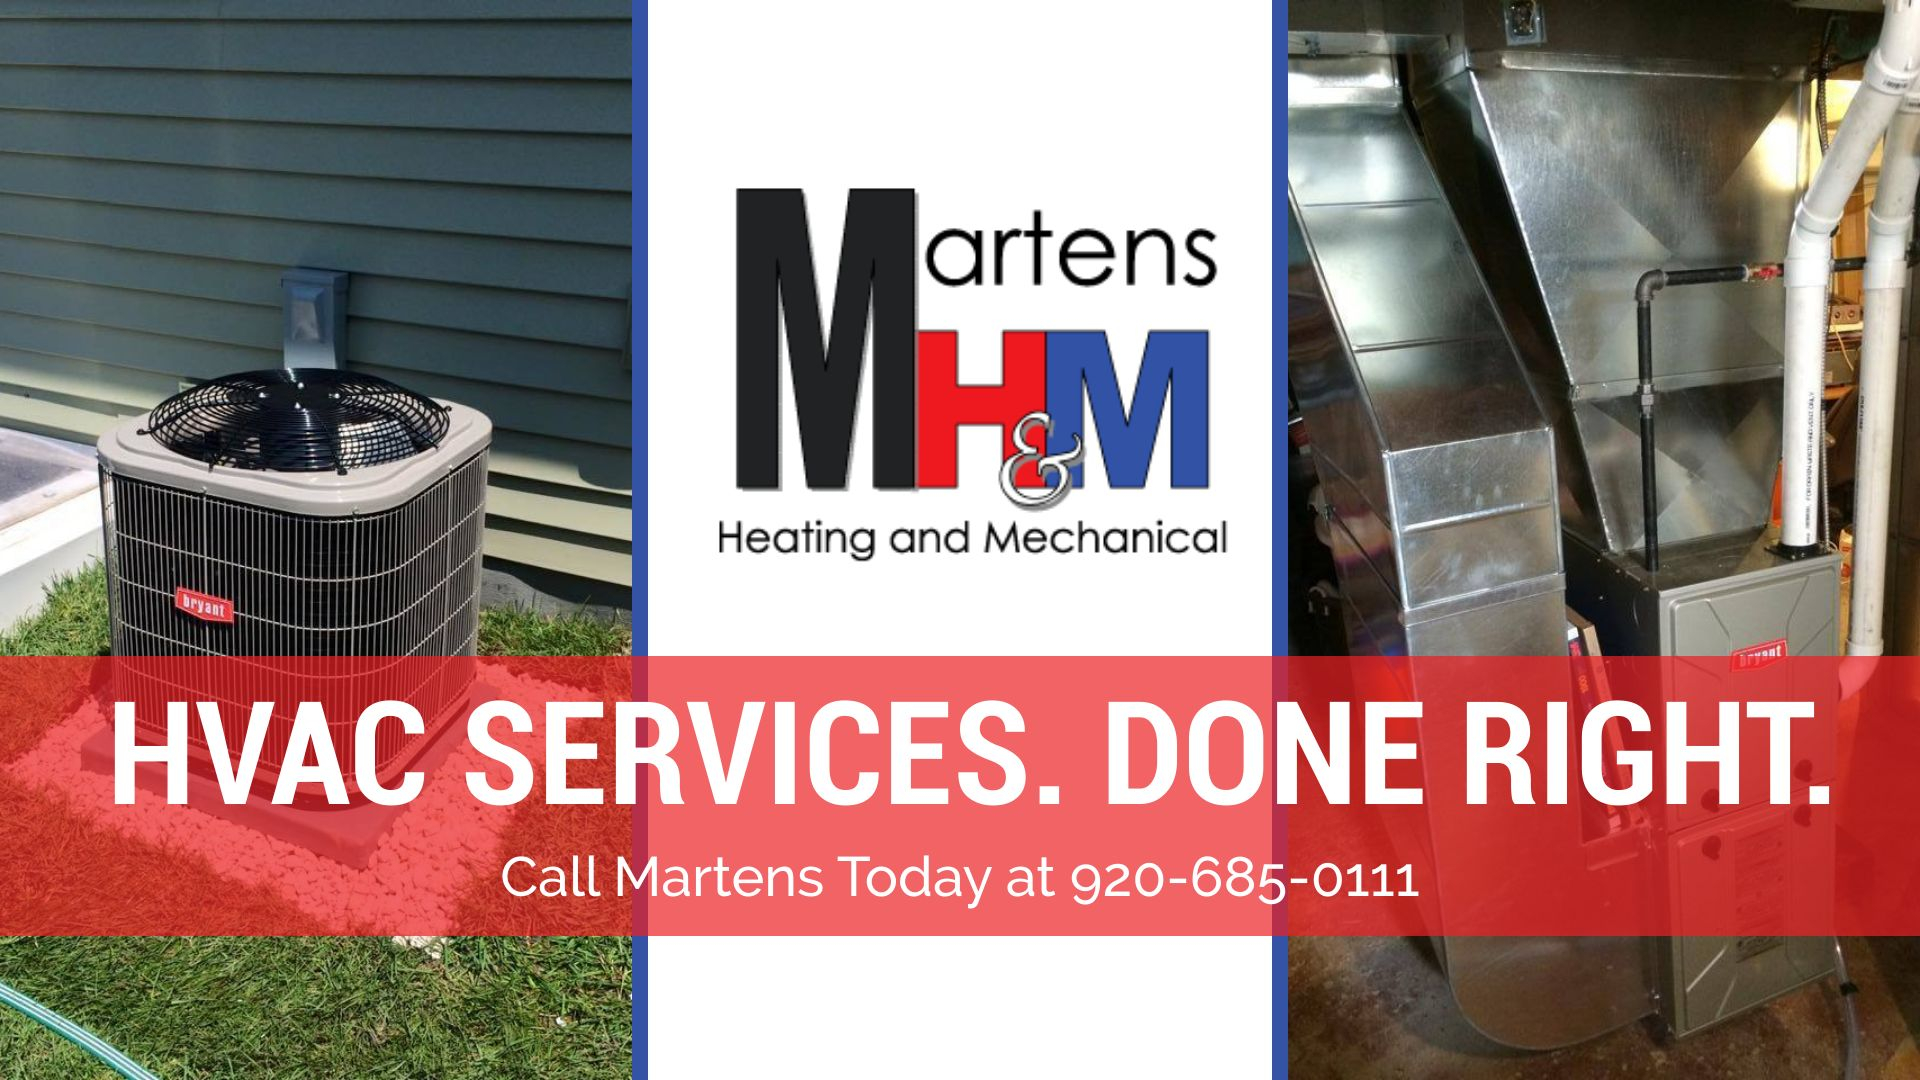 Martens Heating and Mechanical Shares the Benefits of Regular AC Maintenance